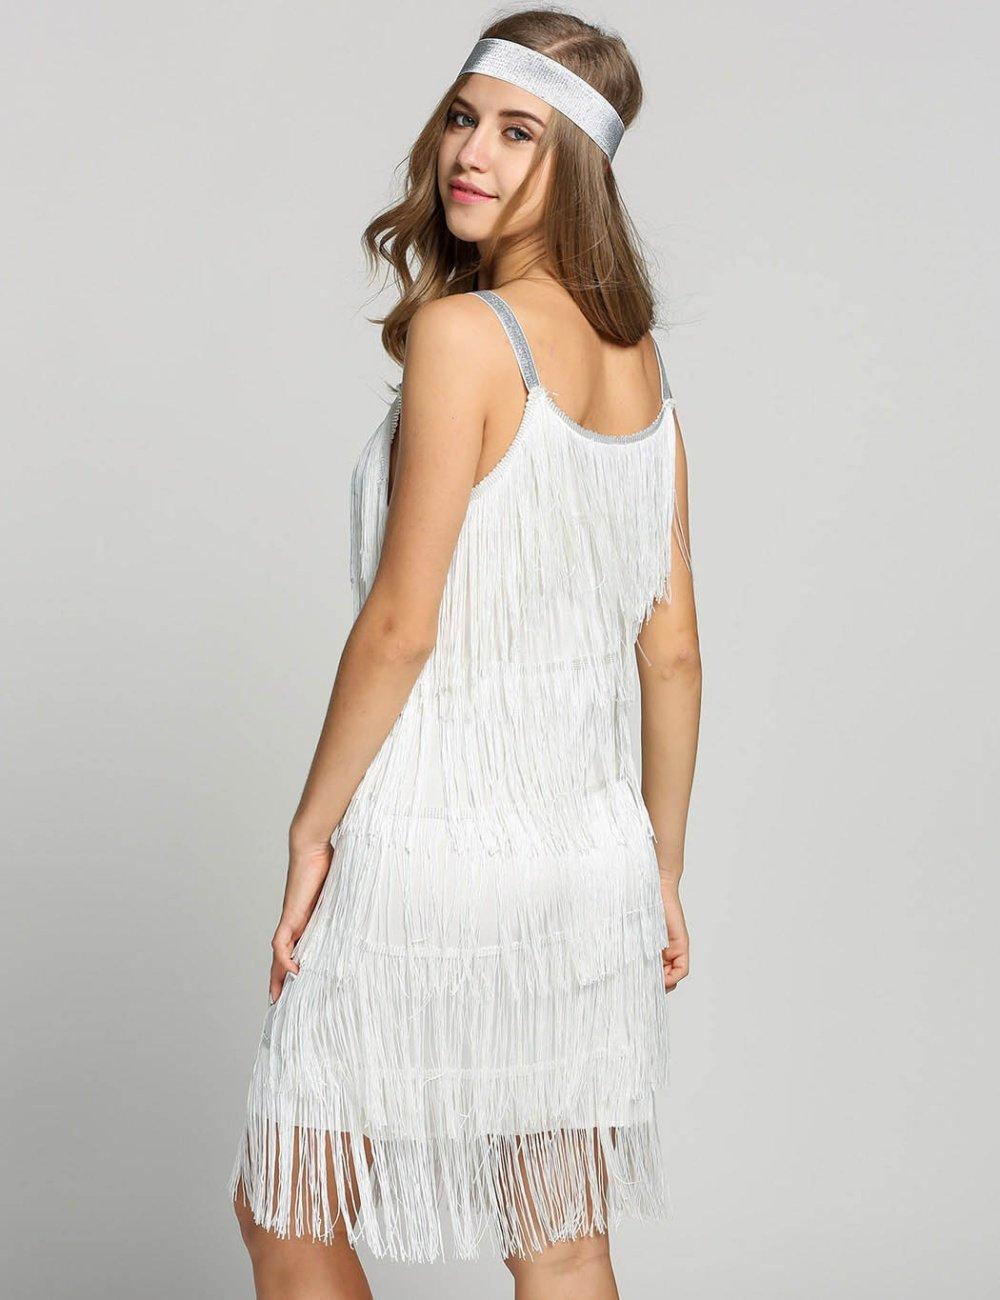 flapper fringe dress (10)